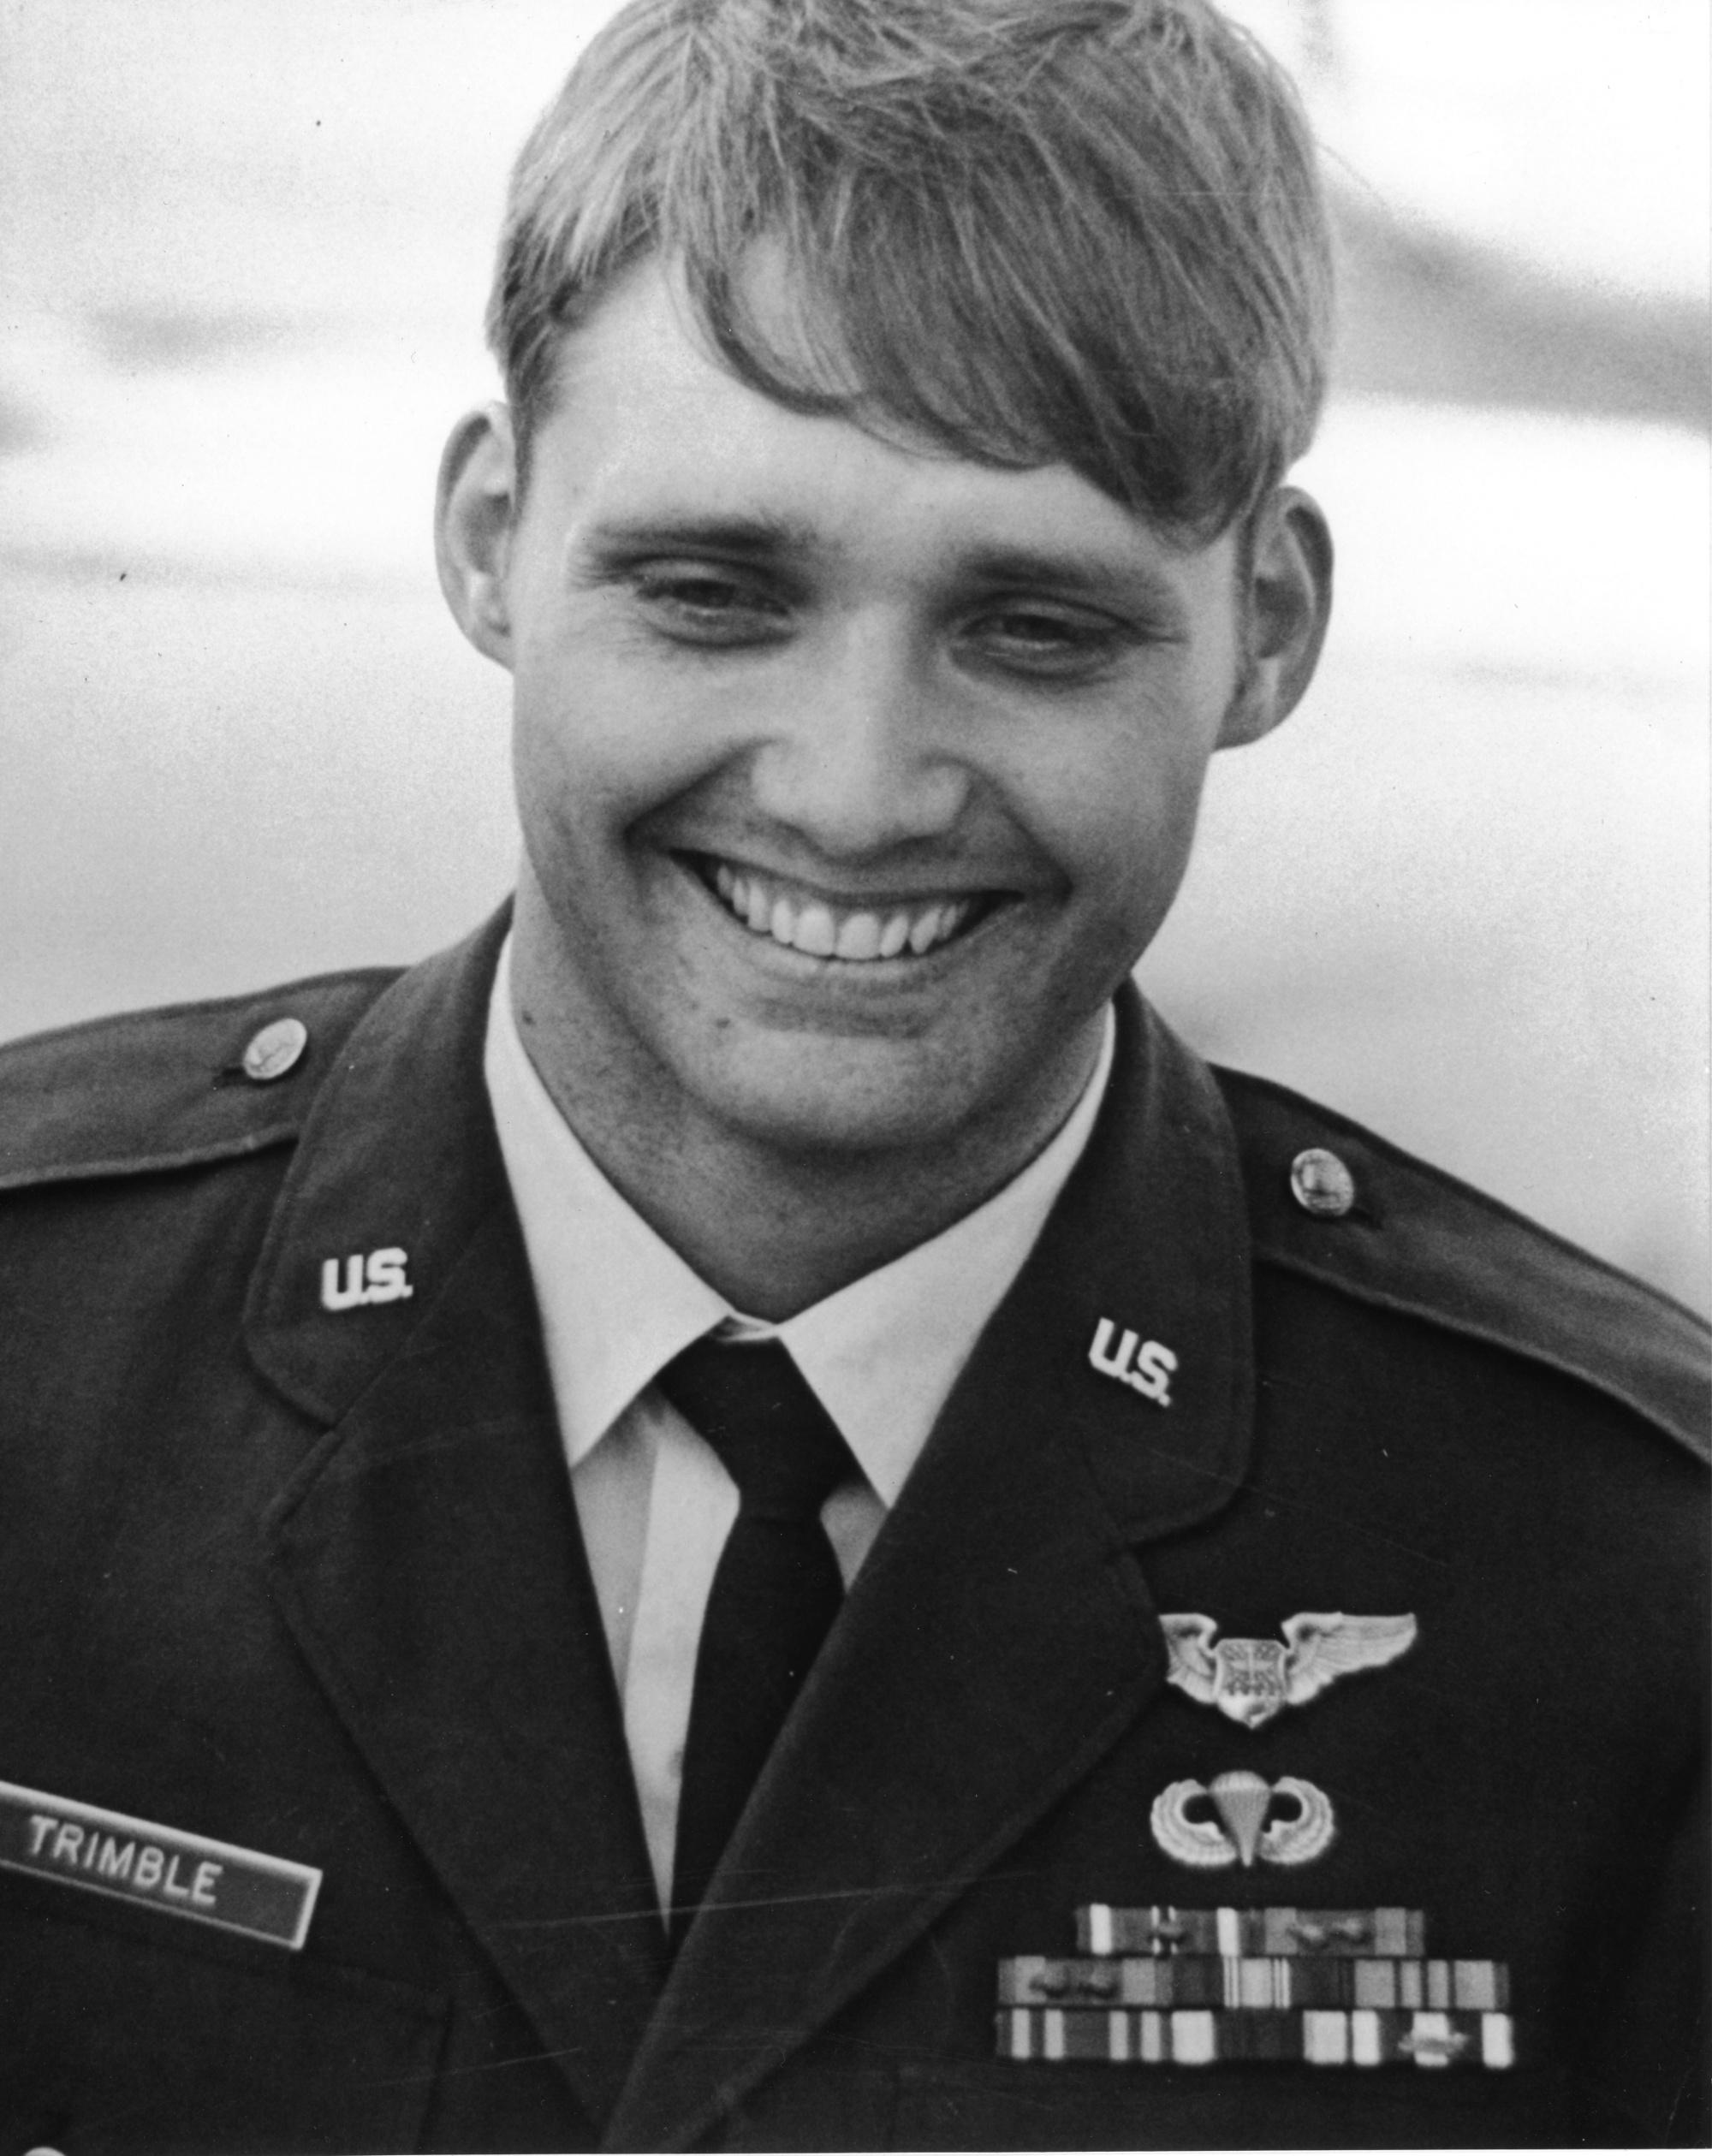 Lt Col Jack Trimble